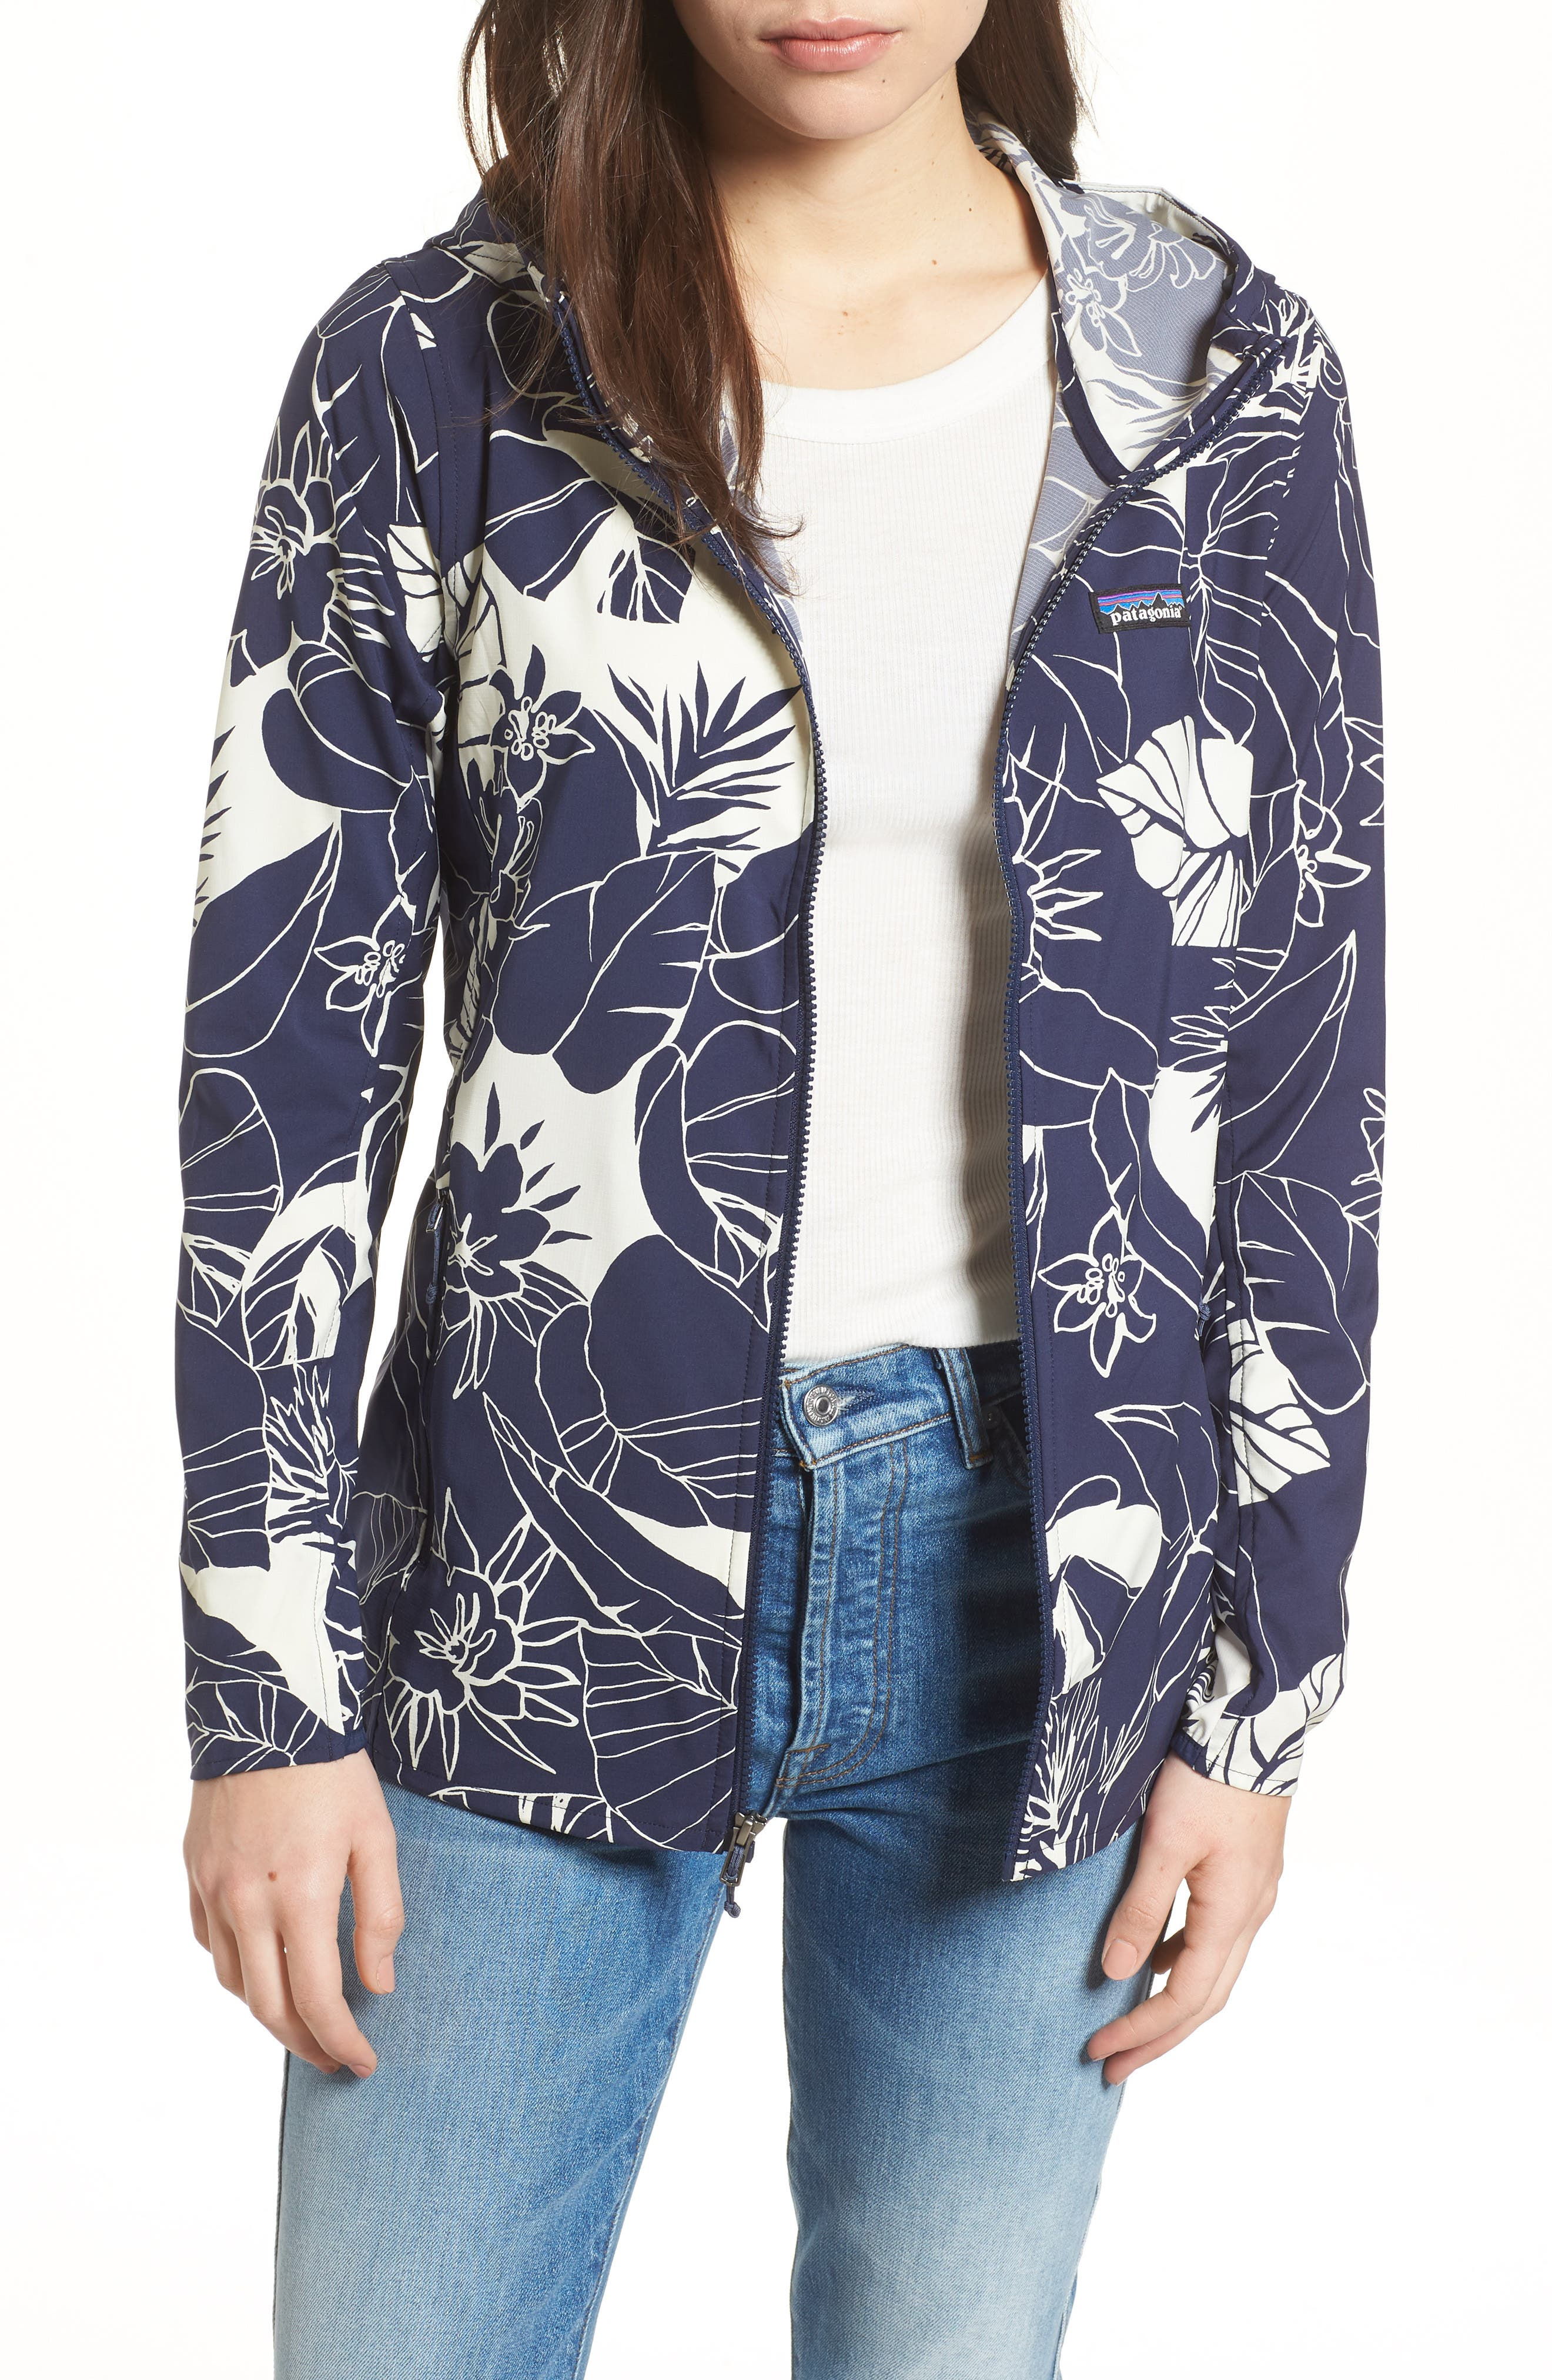 Bajadas Hoodie Jacket,                             Main thumbnail 1, color,                             CLASSIC NAVY/ BIRCH WHITE